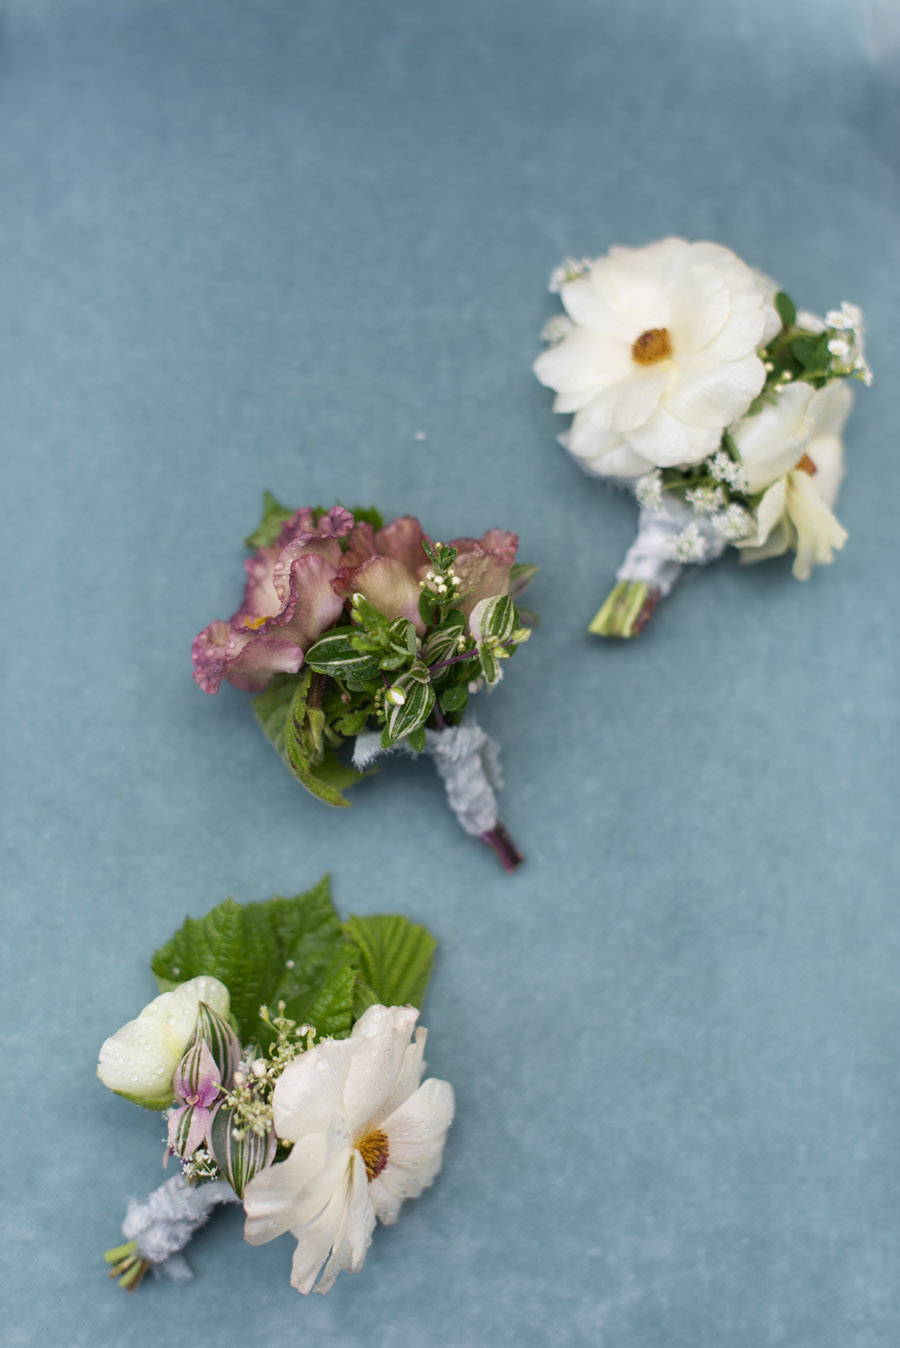 floral wedding ideas at Millbridge Court on English Wedding - photo credit Julie Michaelsen Photography (16)